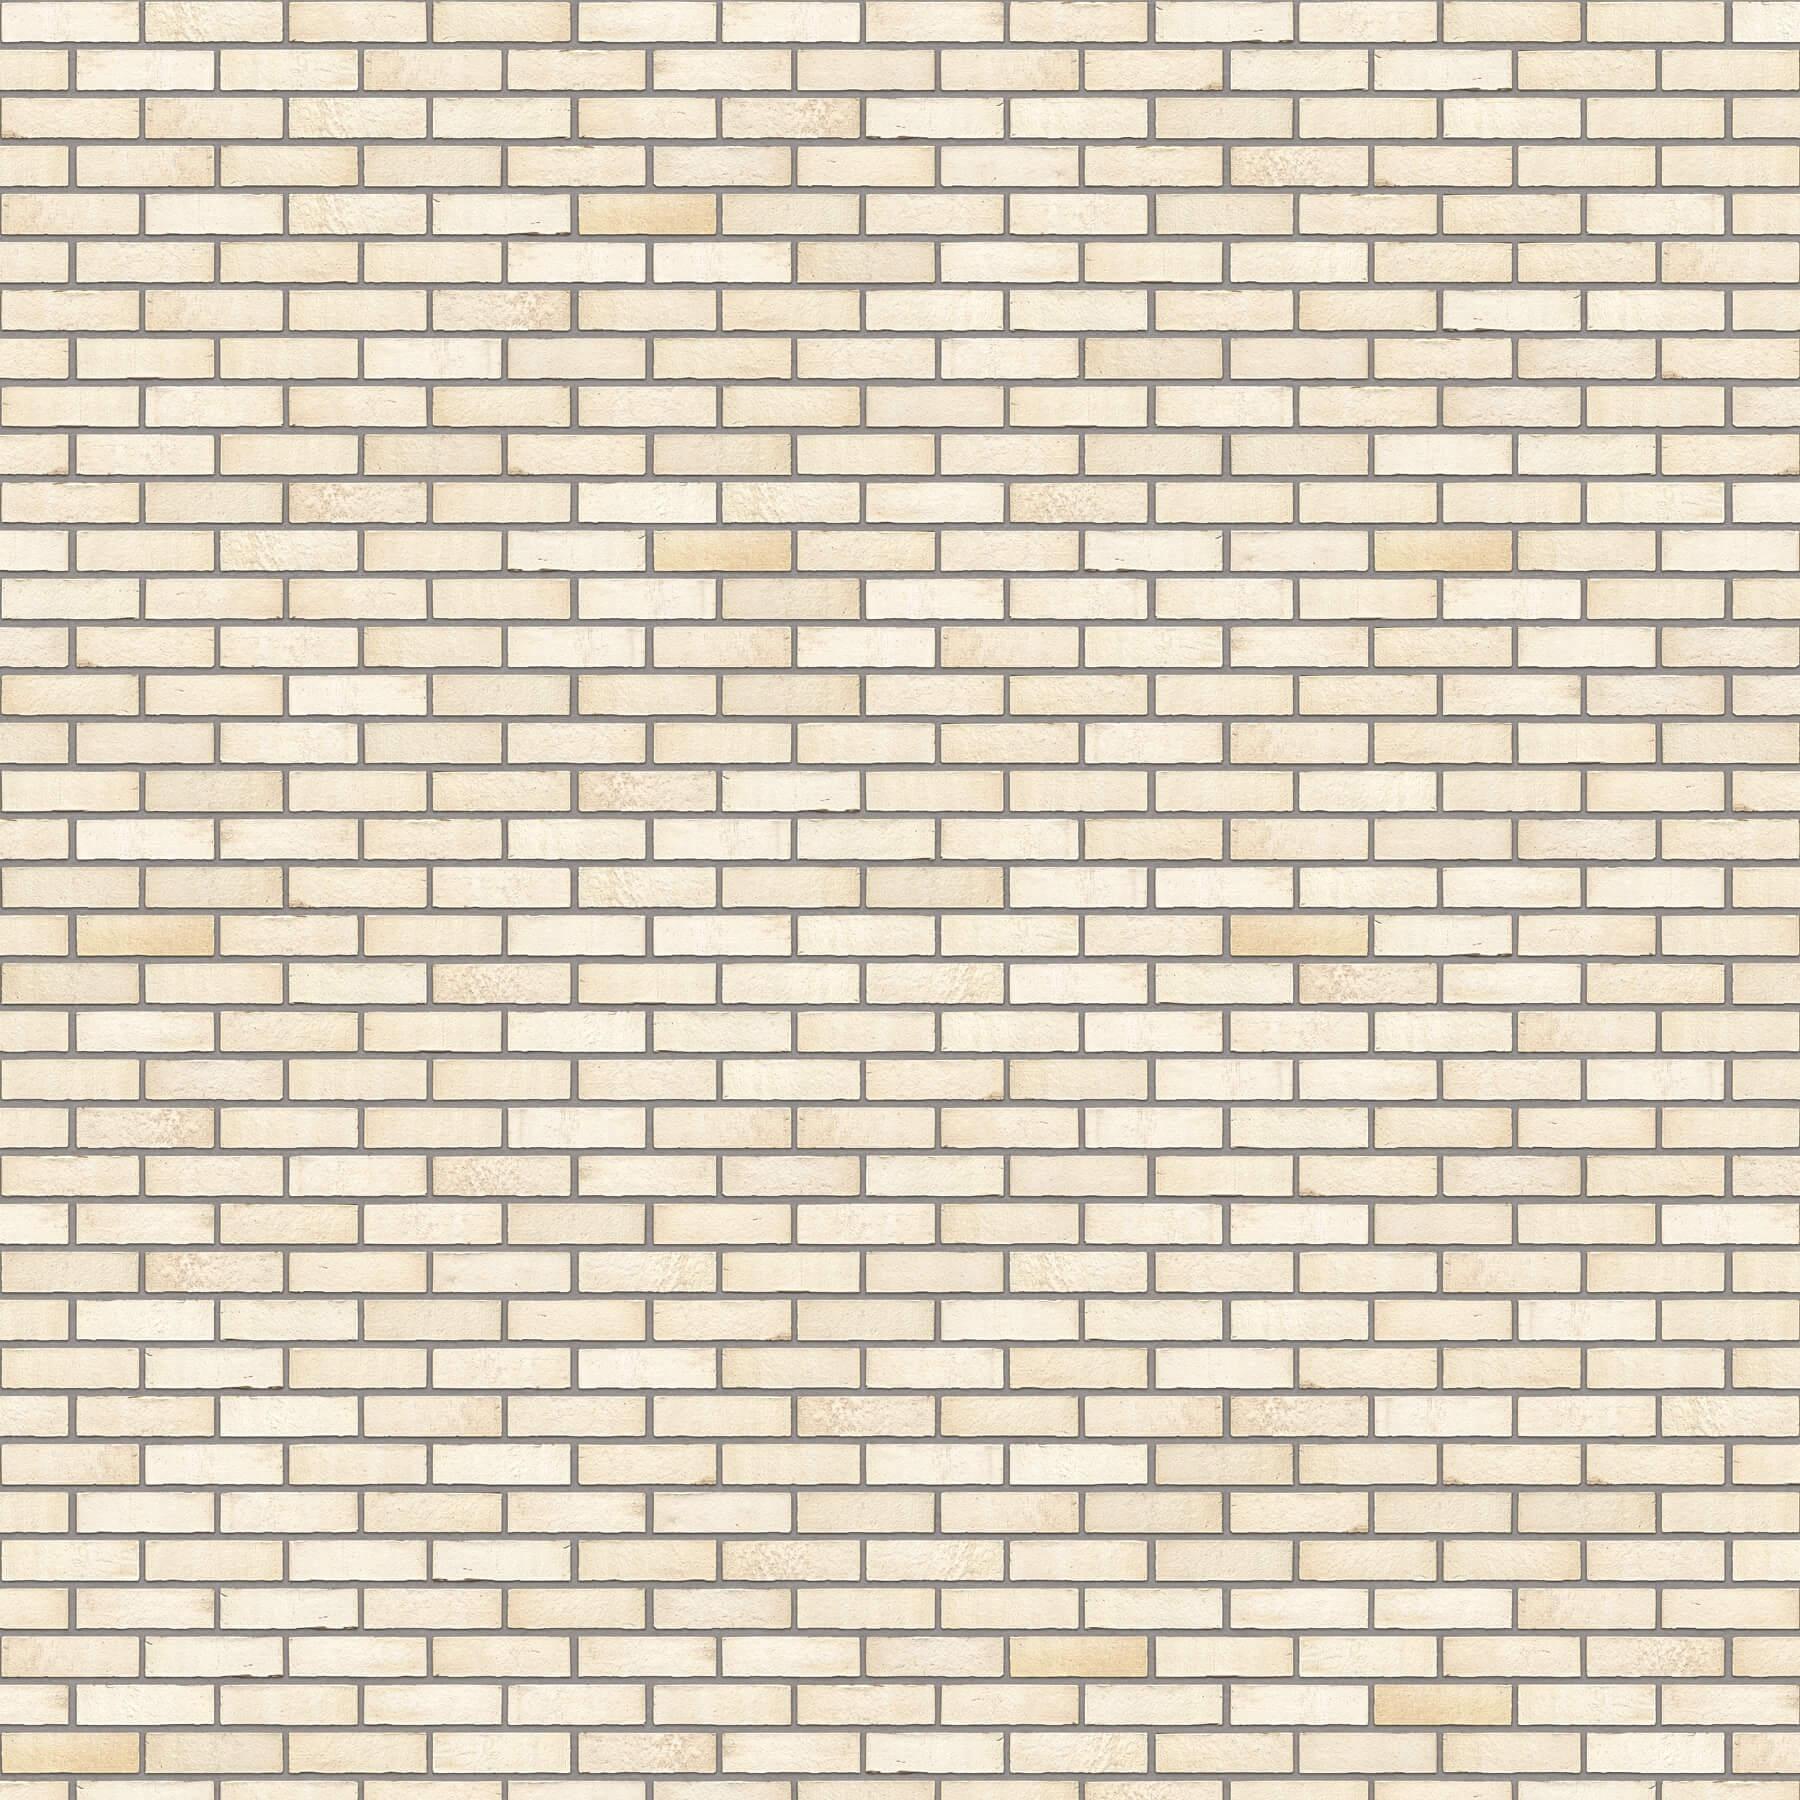 Puna-cigla-FeldHaus-Klinker-brick-house-beograd-nf-k-911-Siva Fuga